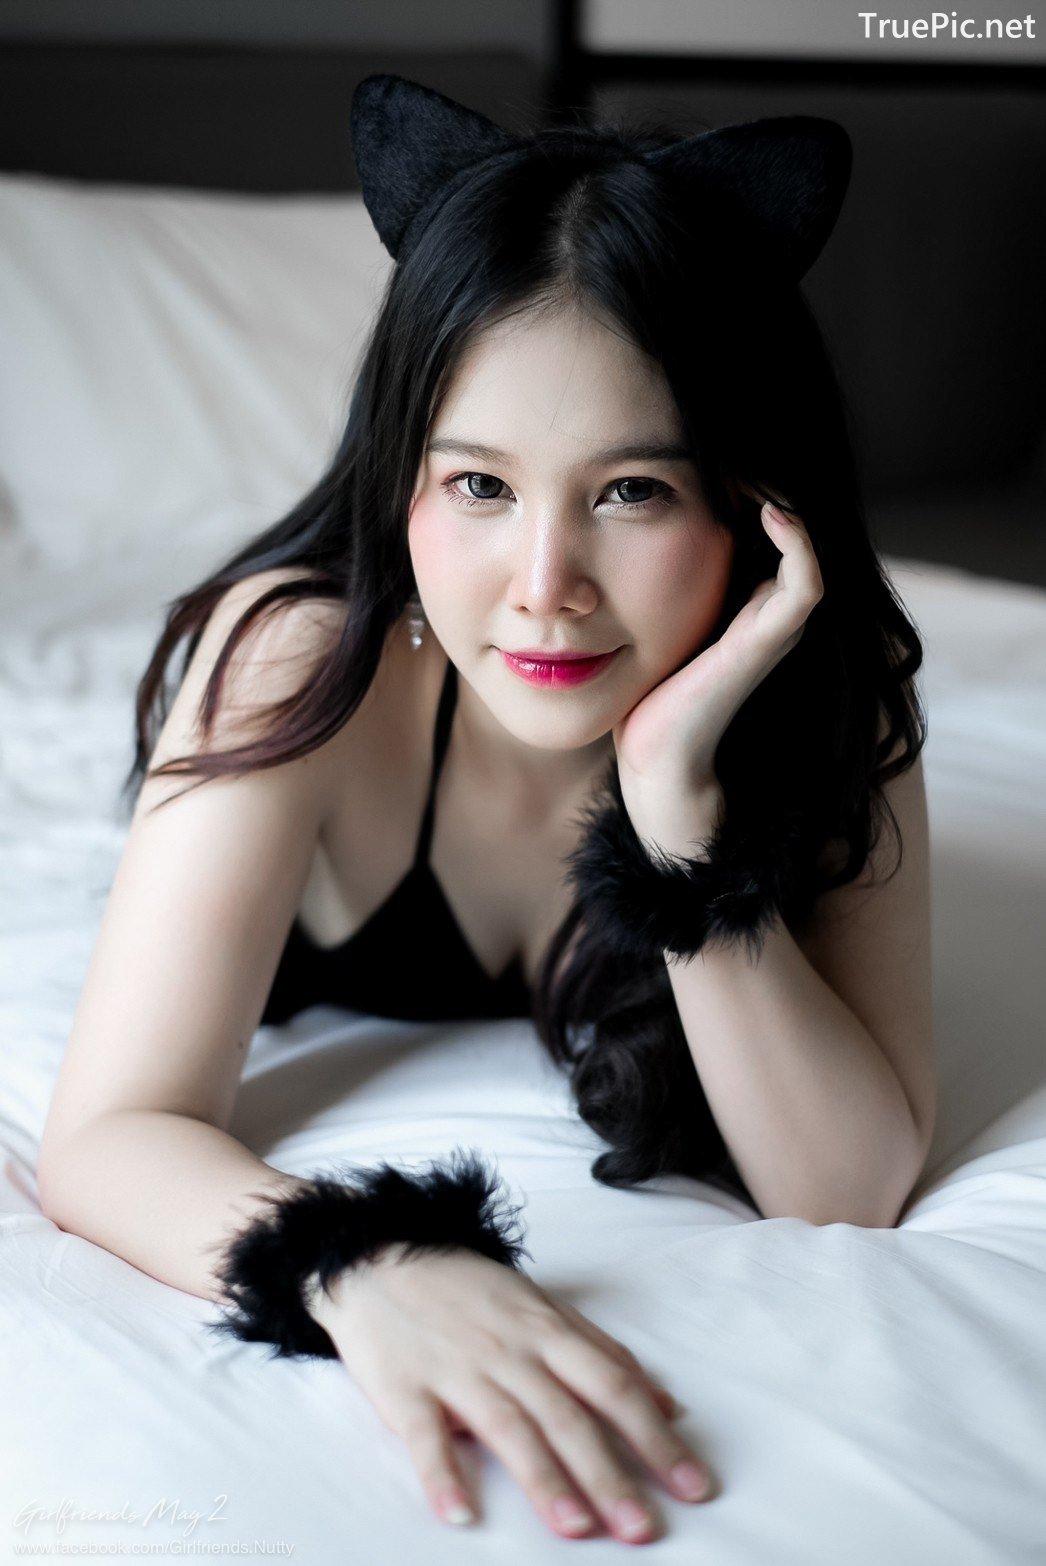 Image Thailand Model - Chanunshida Phuangsombut - Sexy Black Cat - TruePic.net - Picture-4